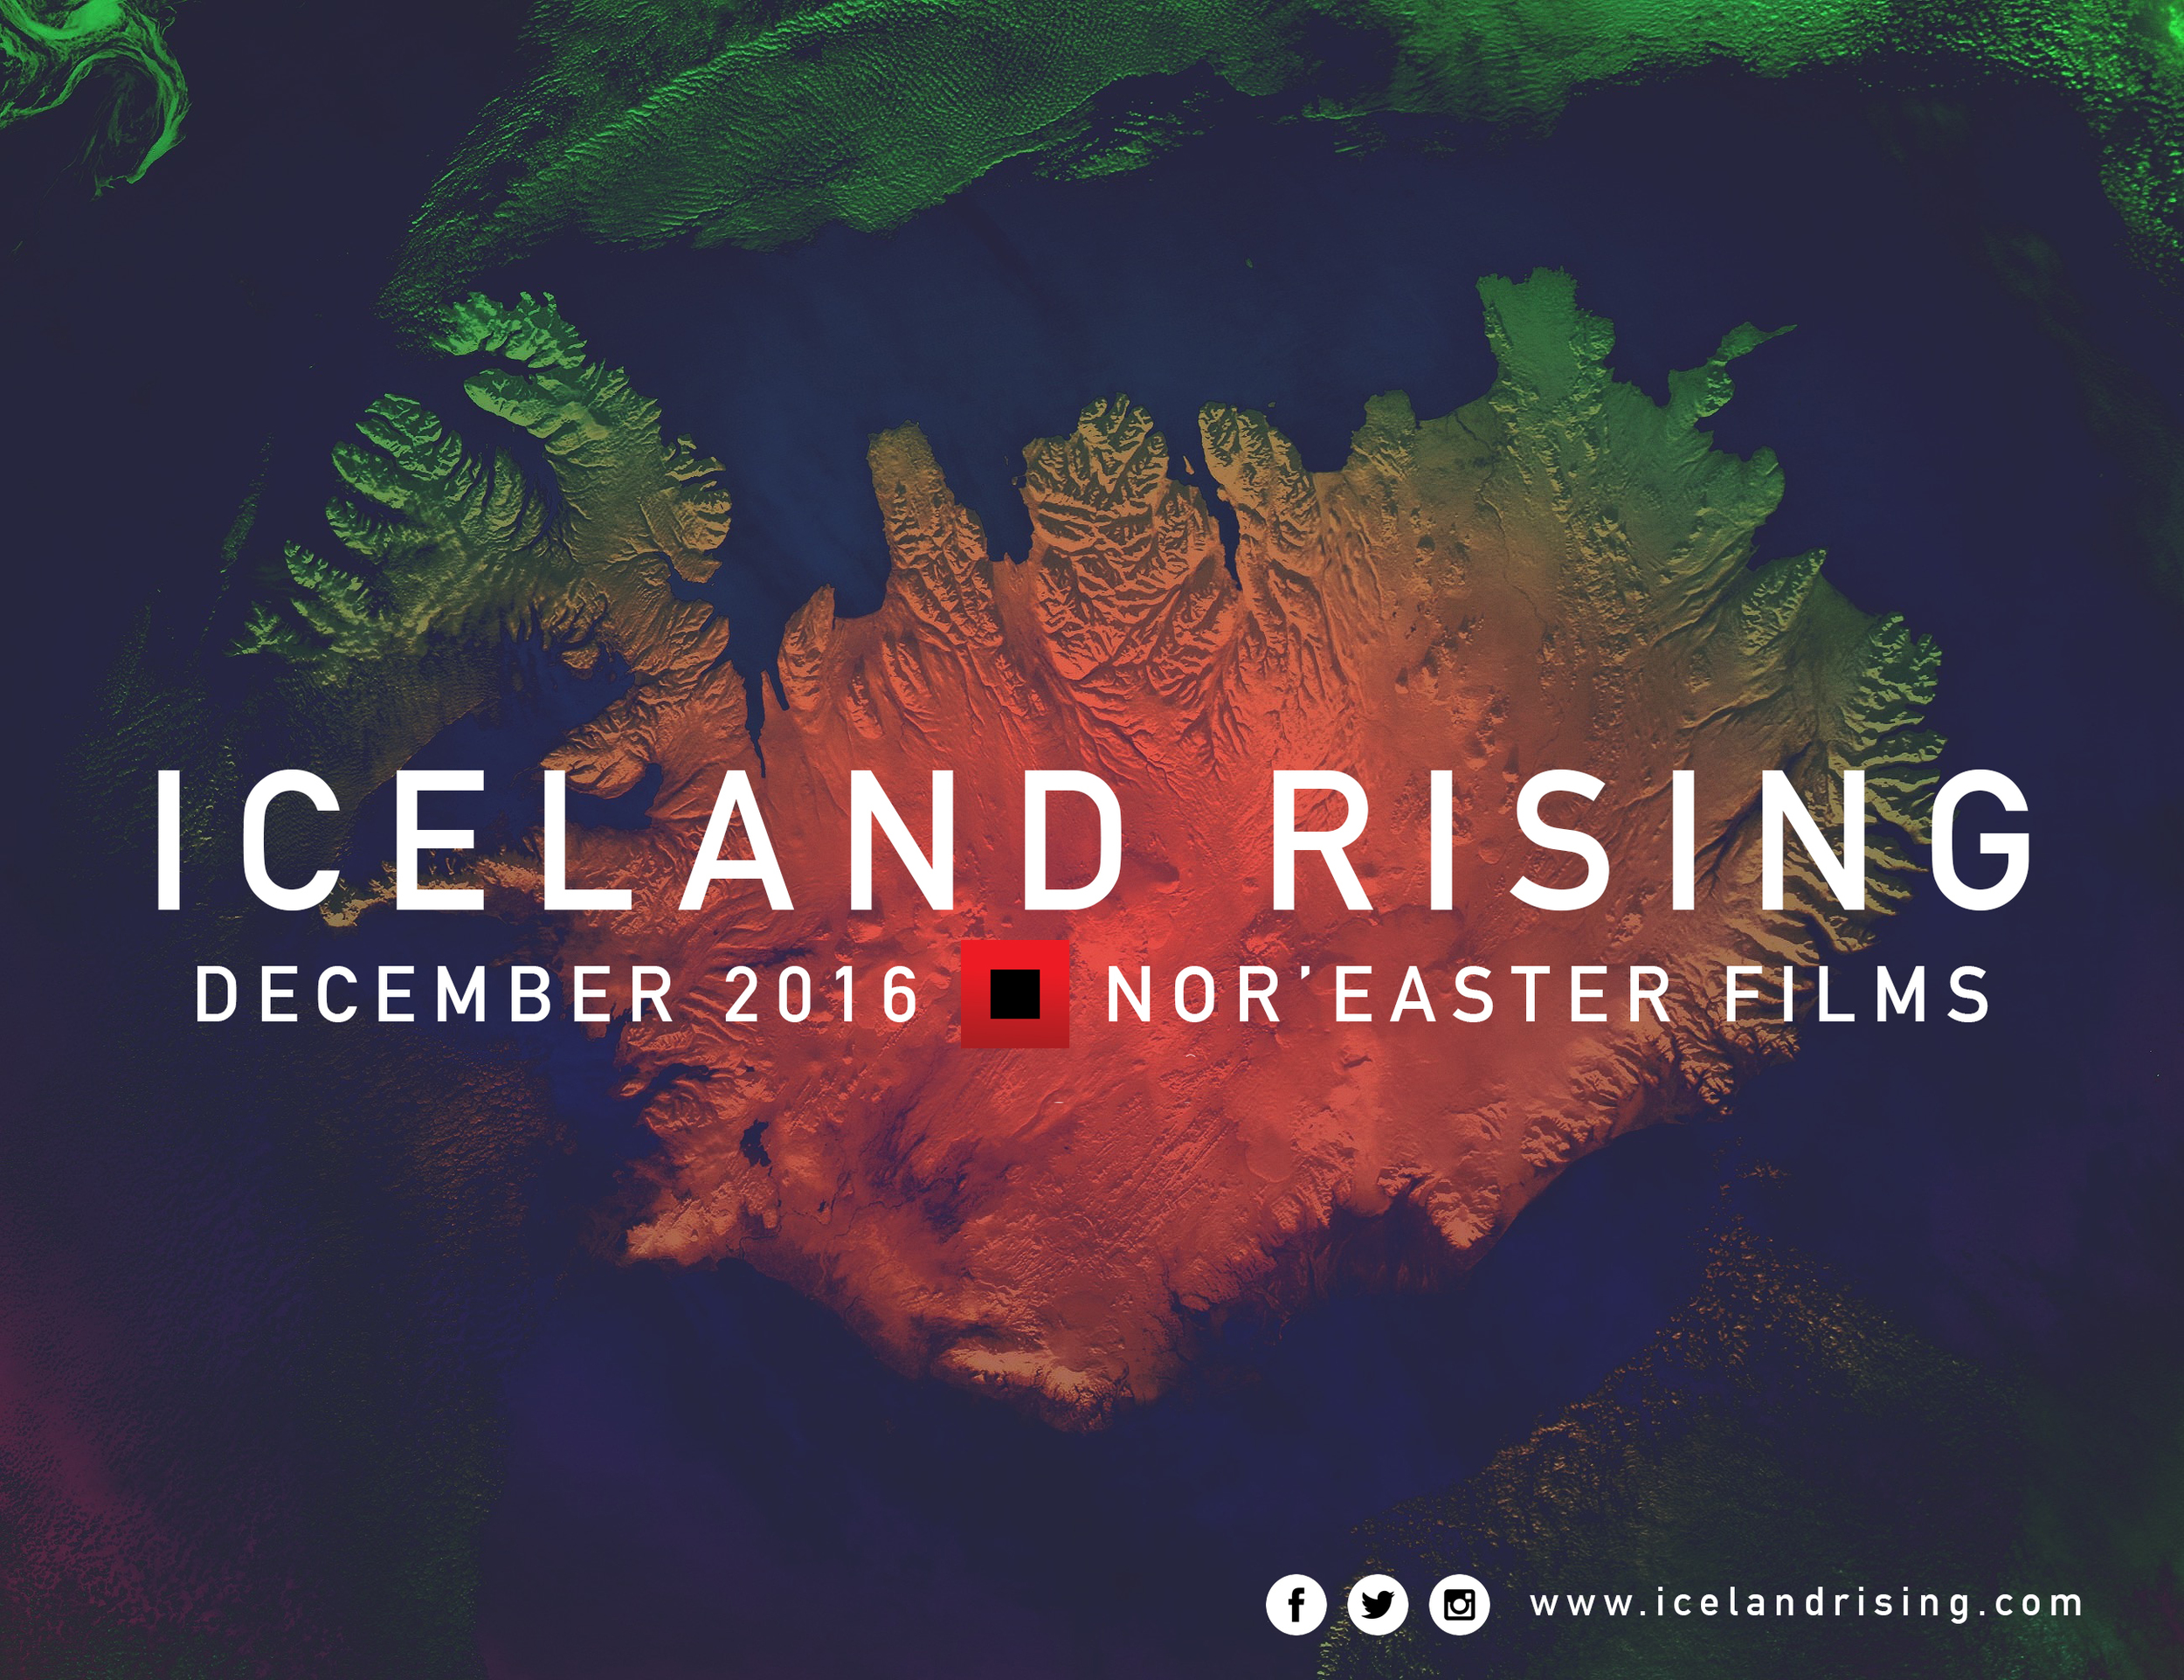 www.icelandrising.com